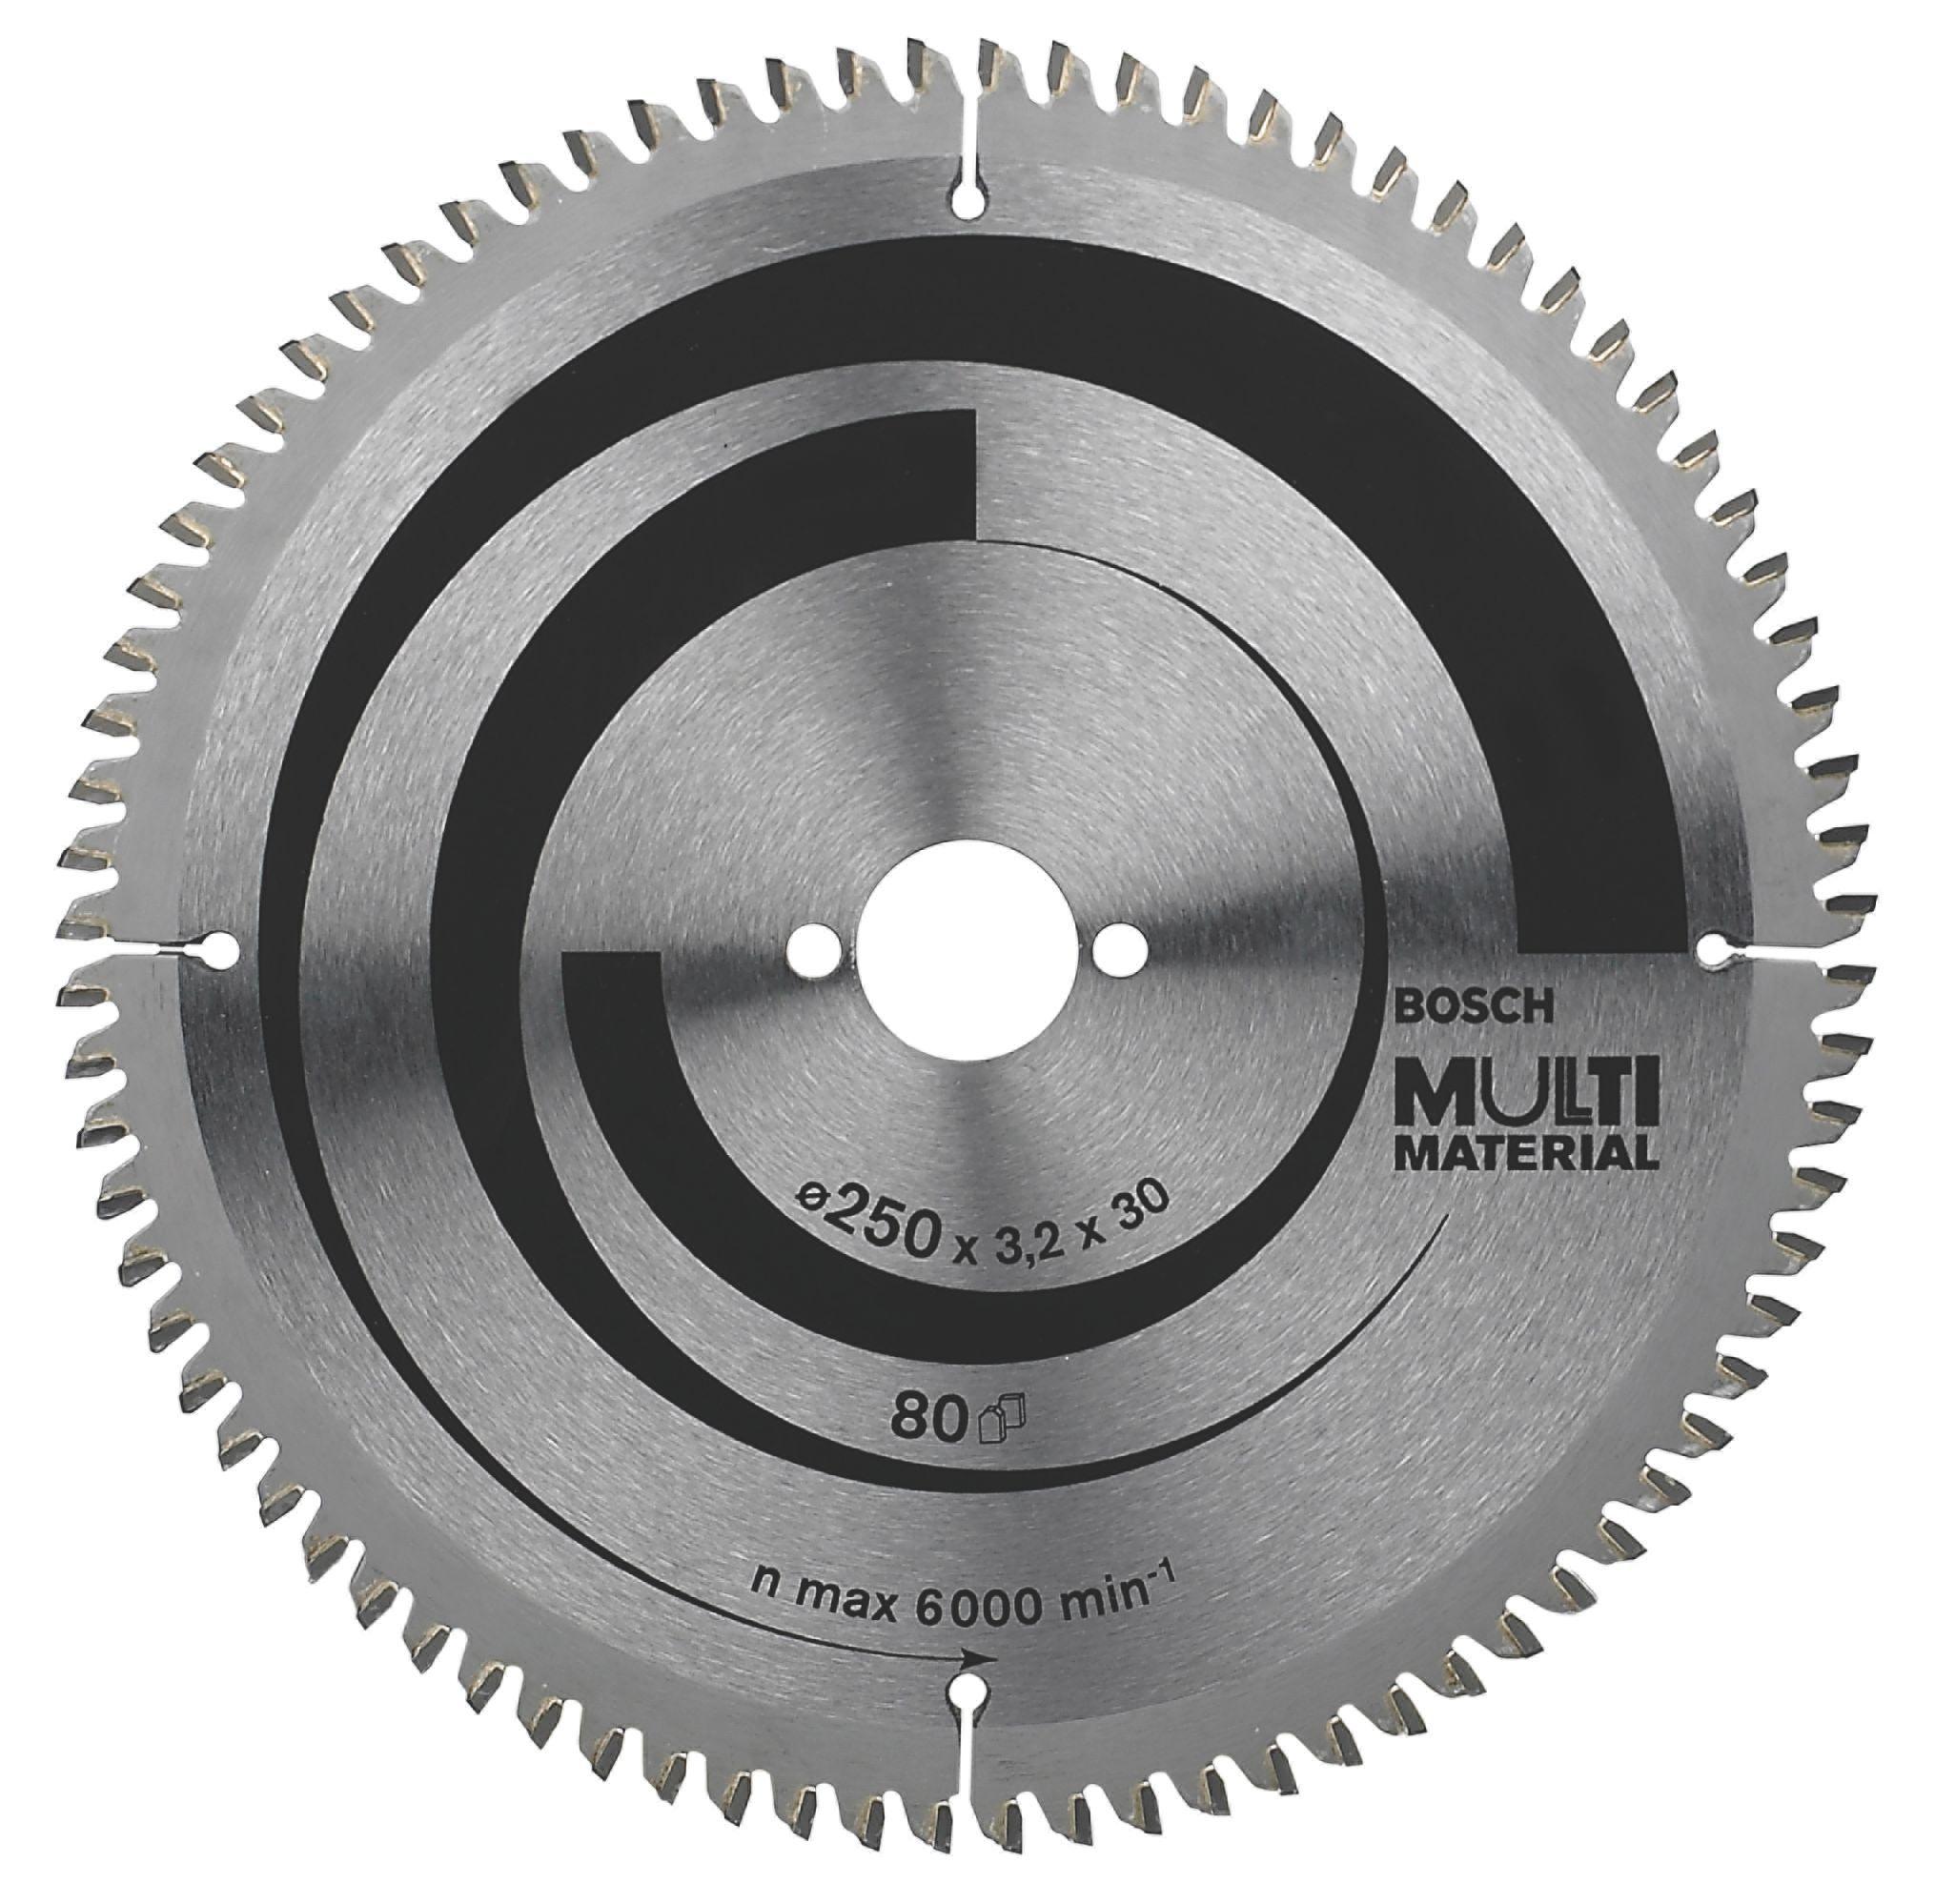 Bosch 80t Circular Saw Blade (dia)250mm